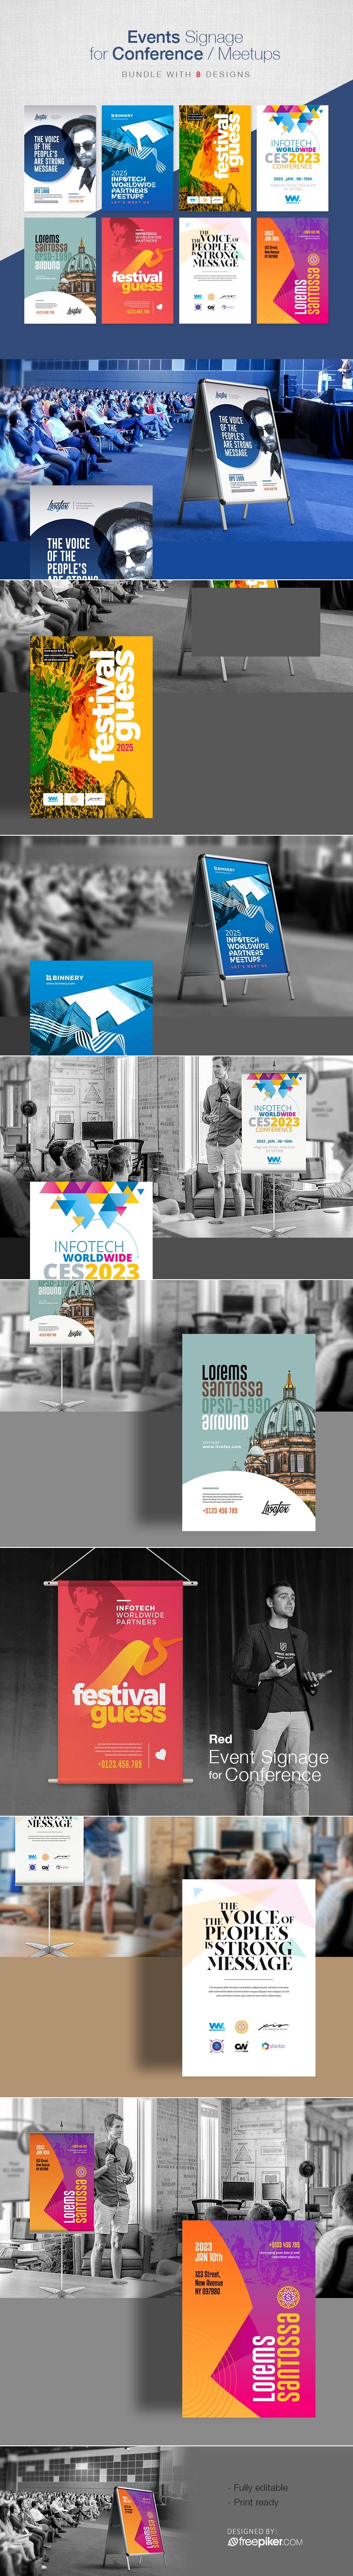 Creative Event Signage Bundle for Conference